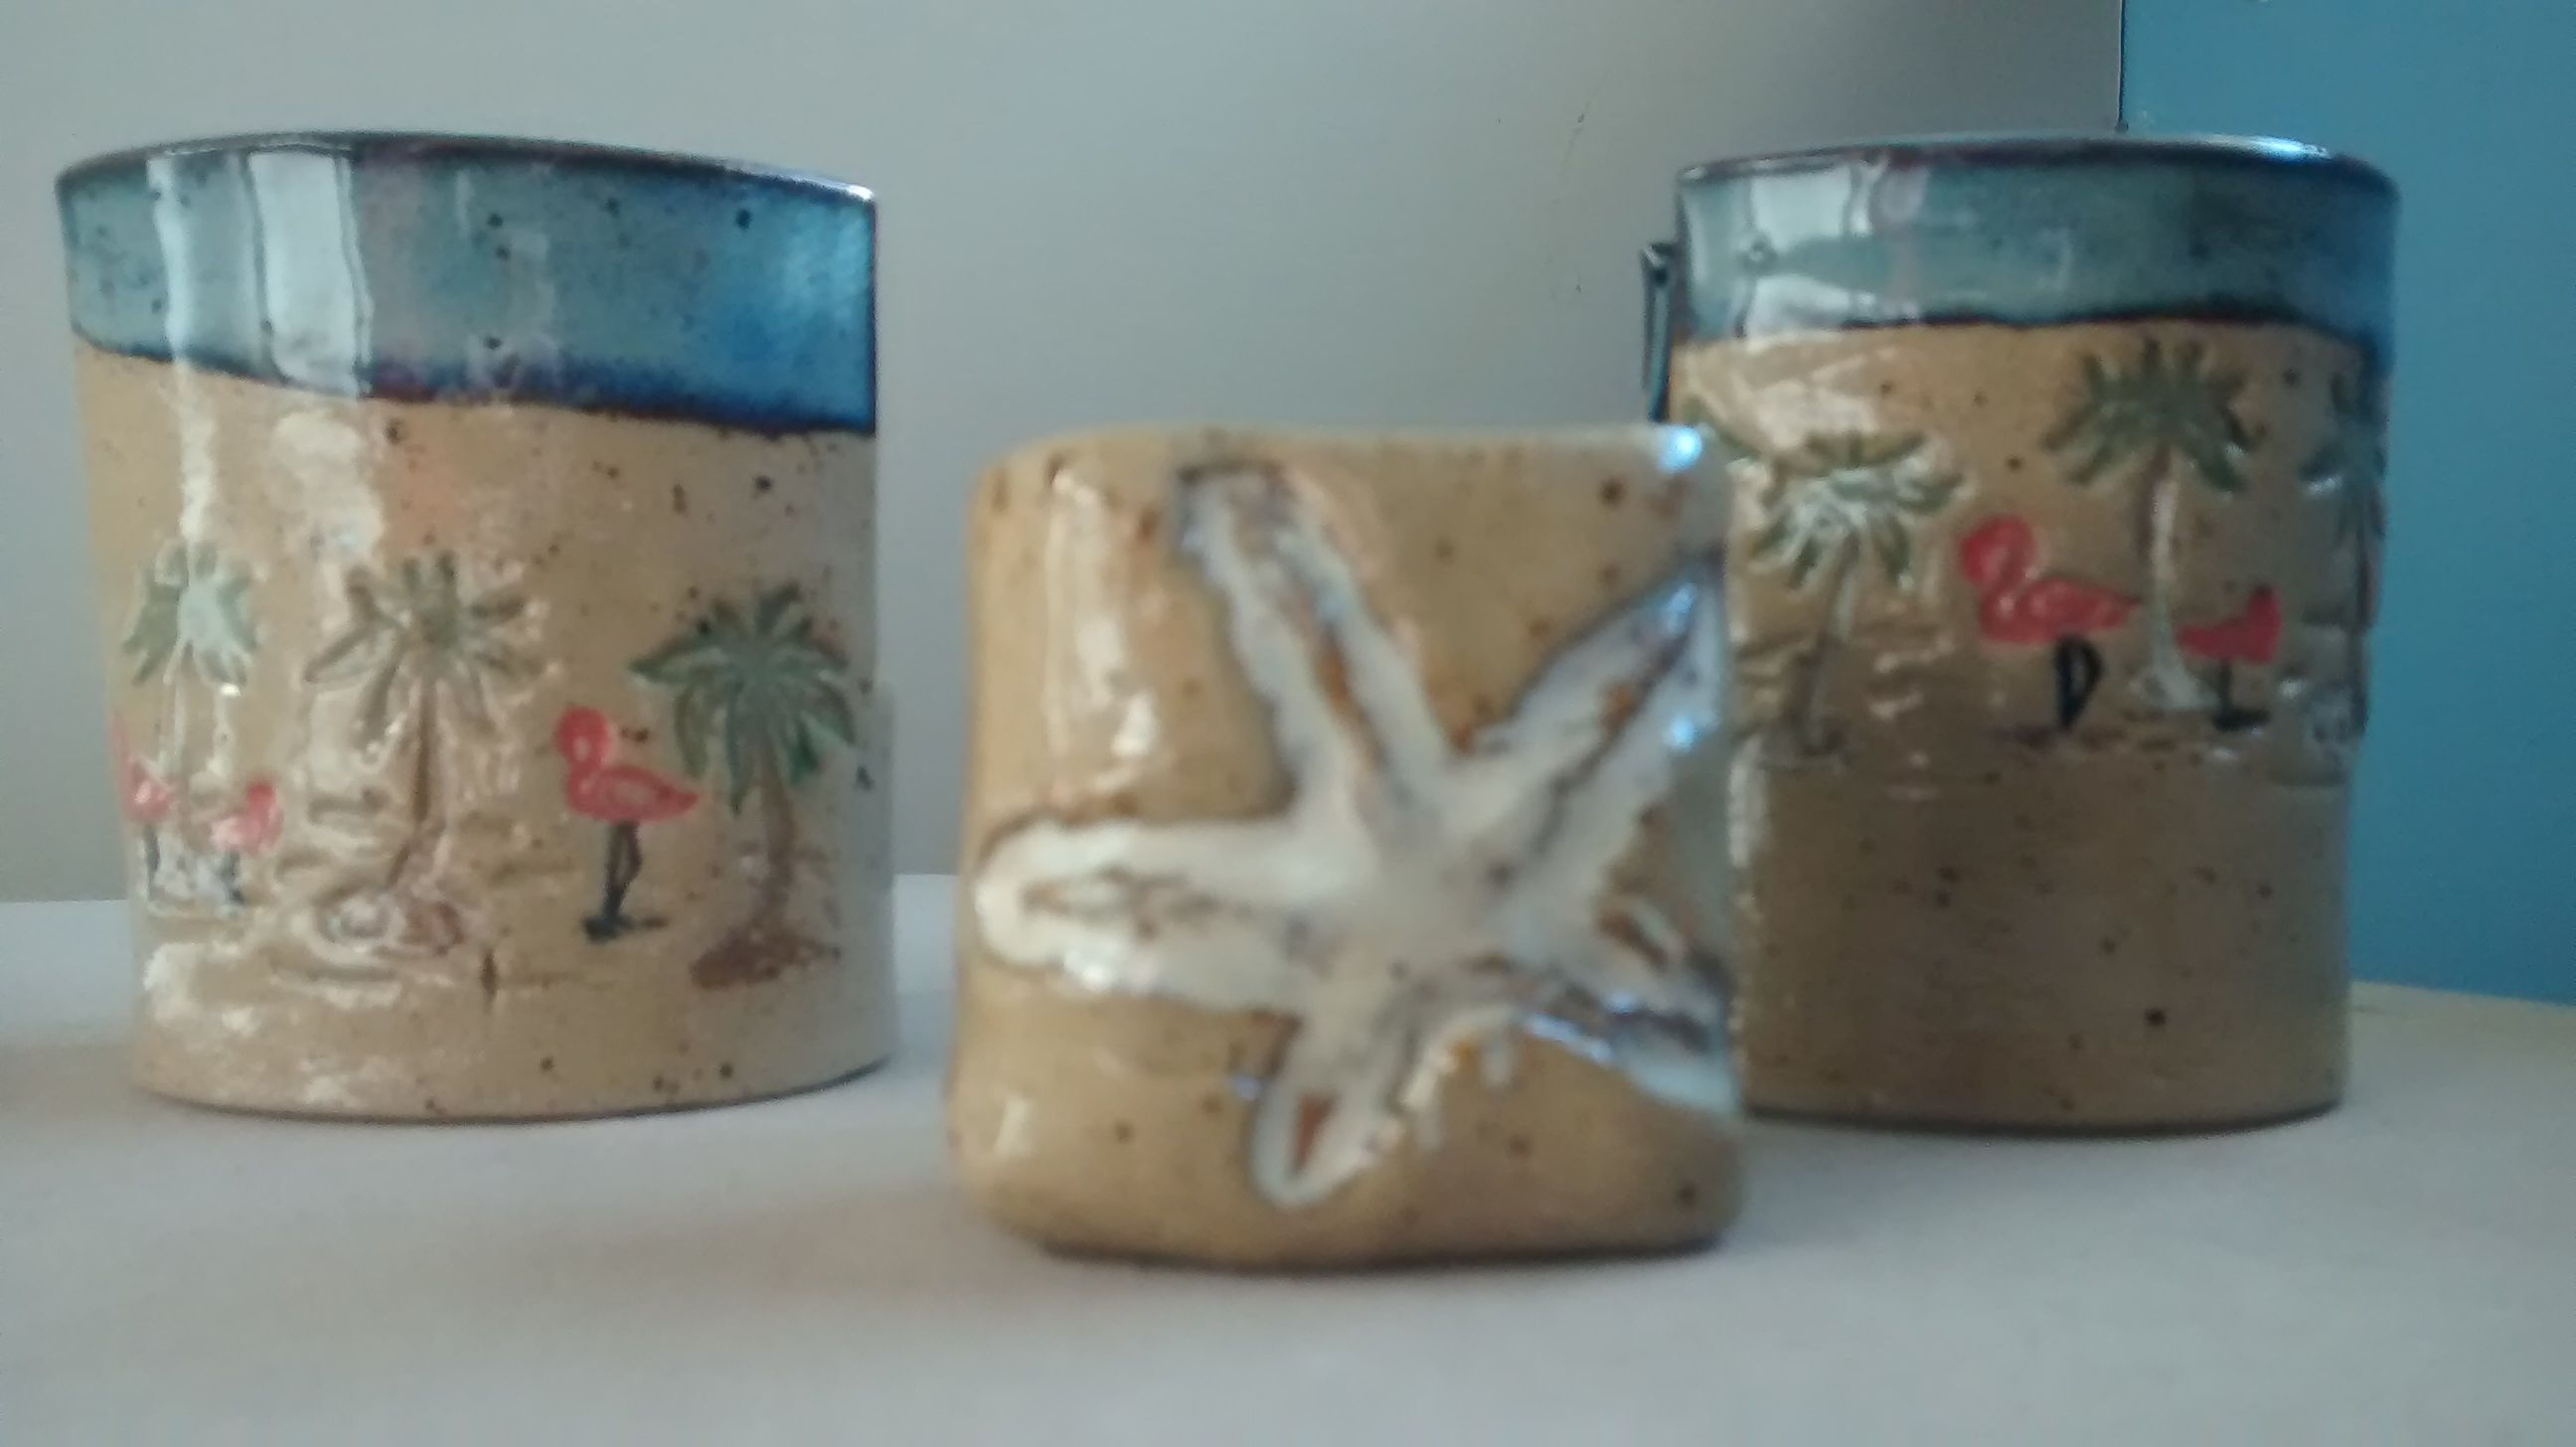 Seashell toothpick holders $7. Large stoneware clay sponge holders $9. each.